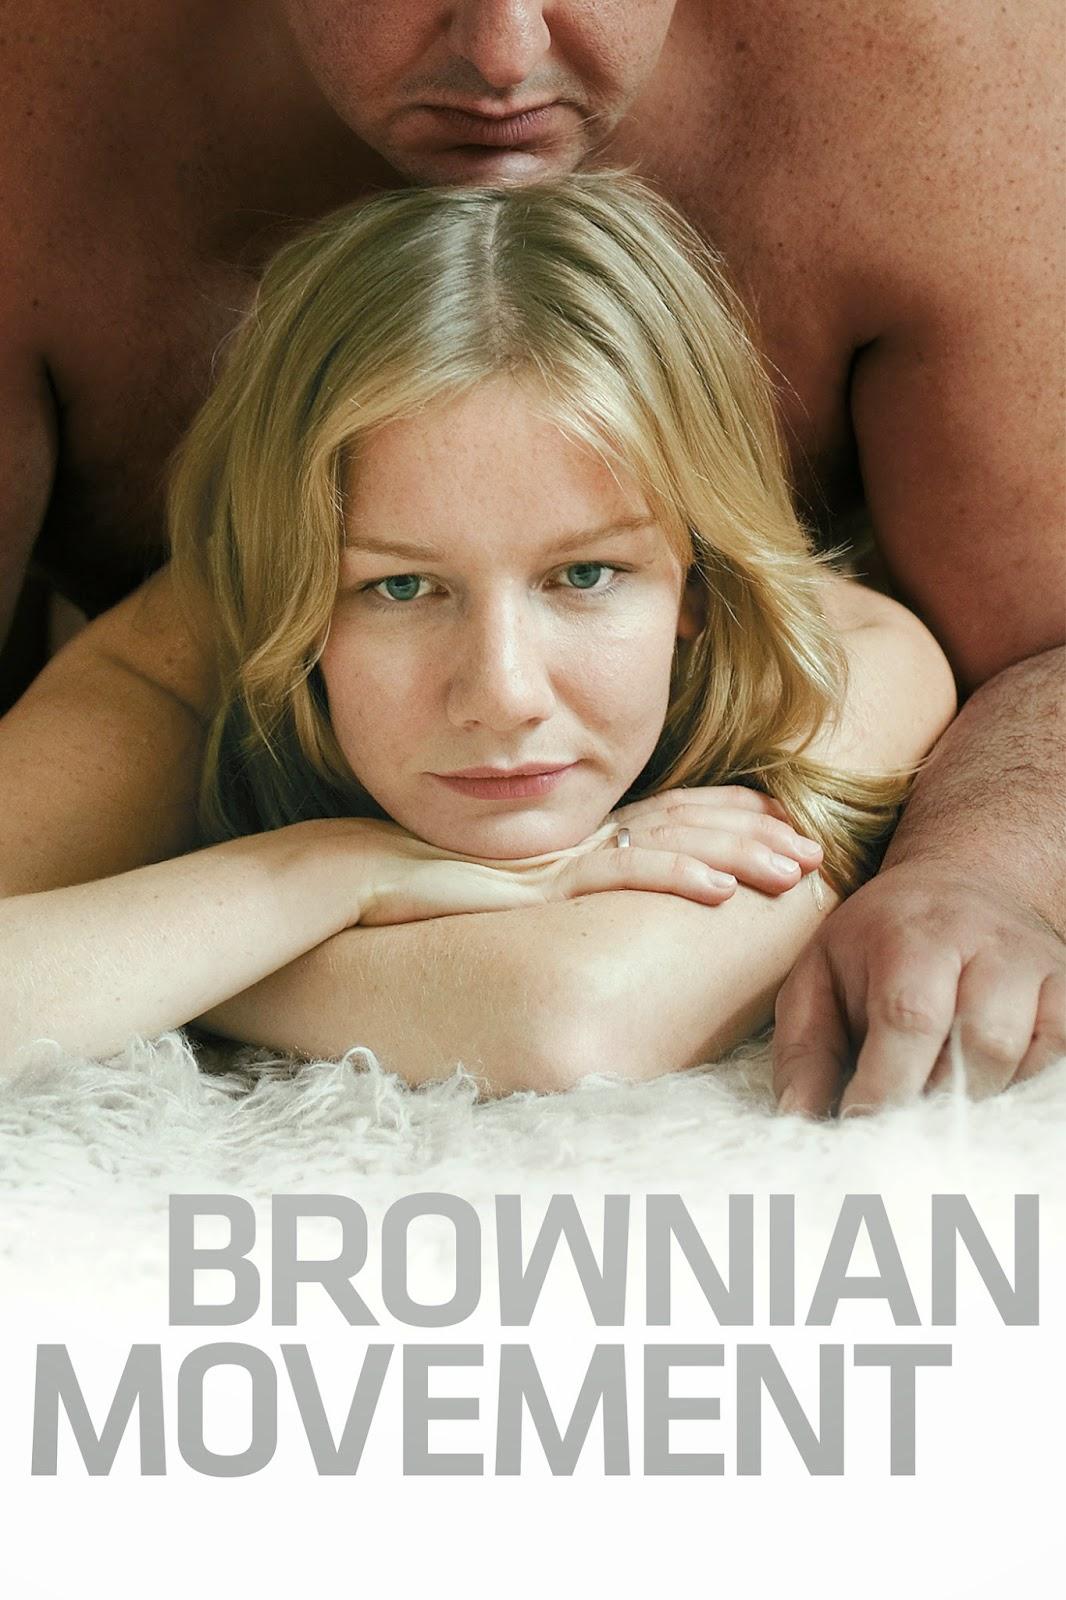 Porn eroticage full hd net sex wild booty